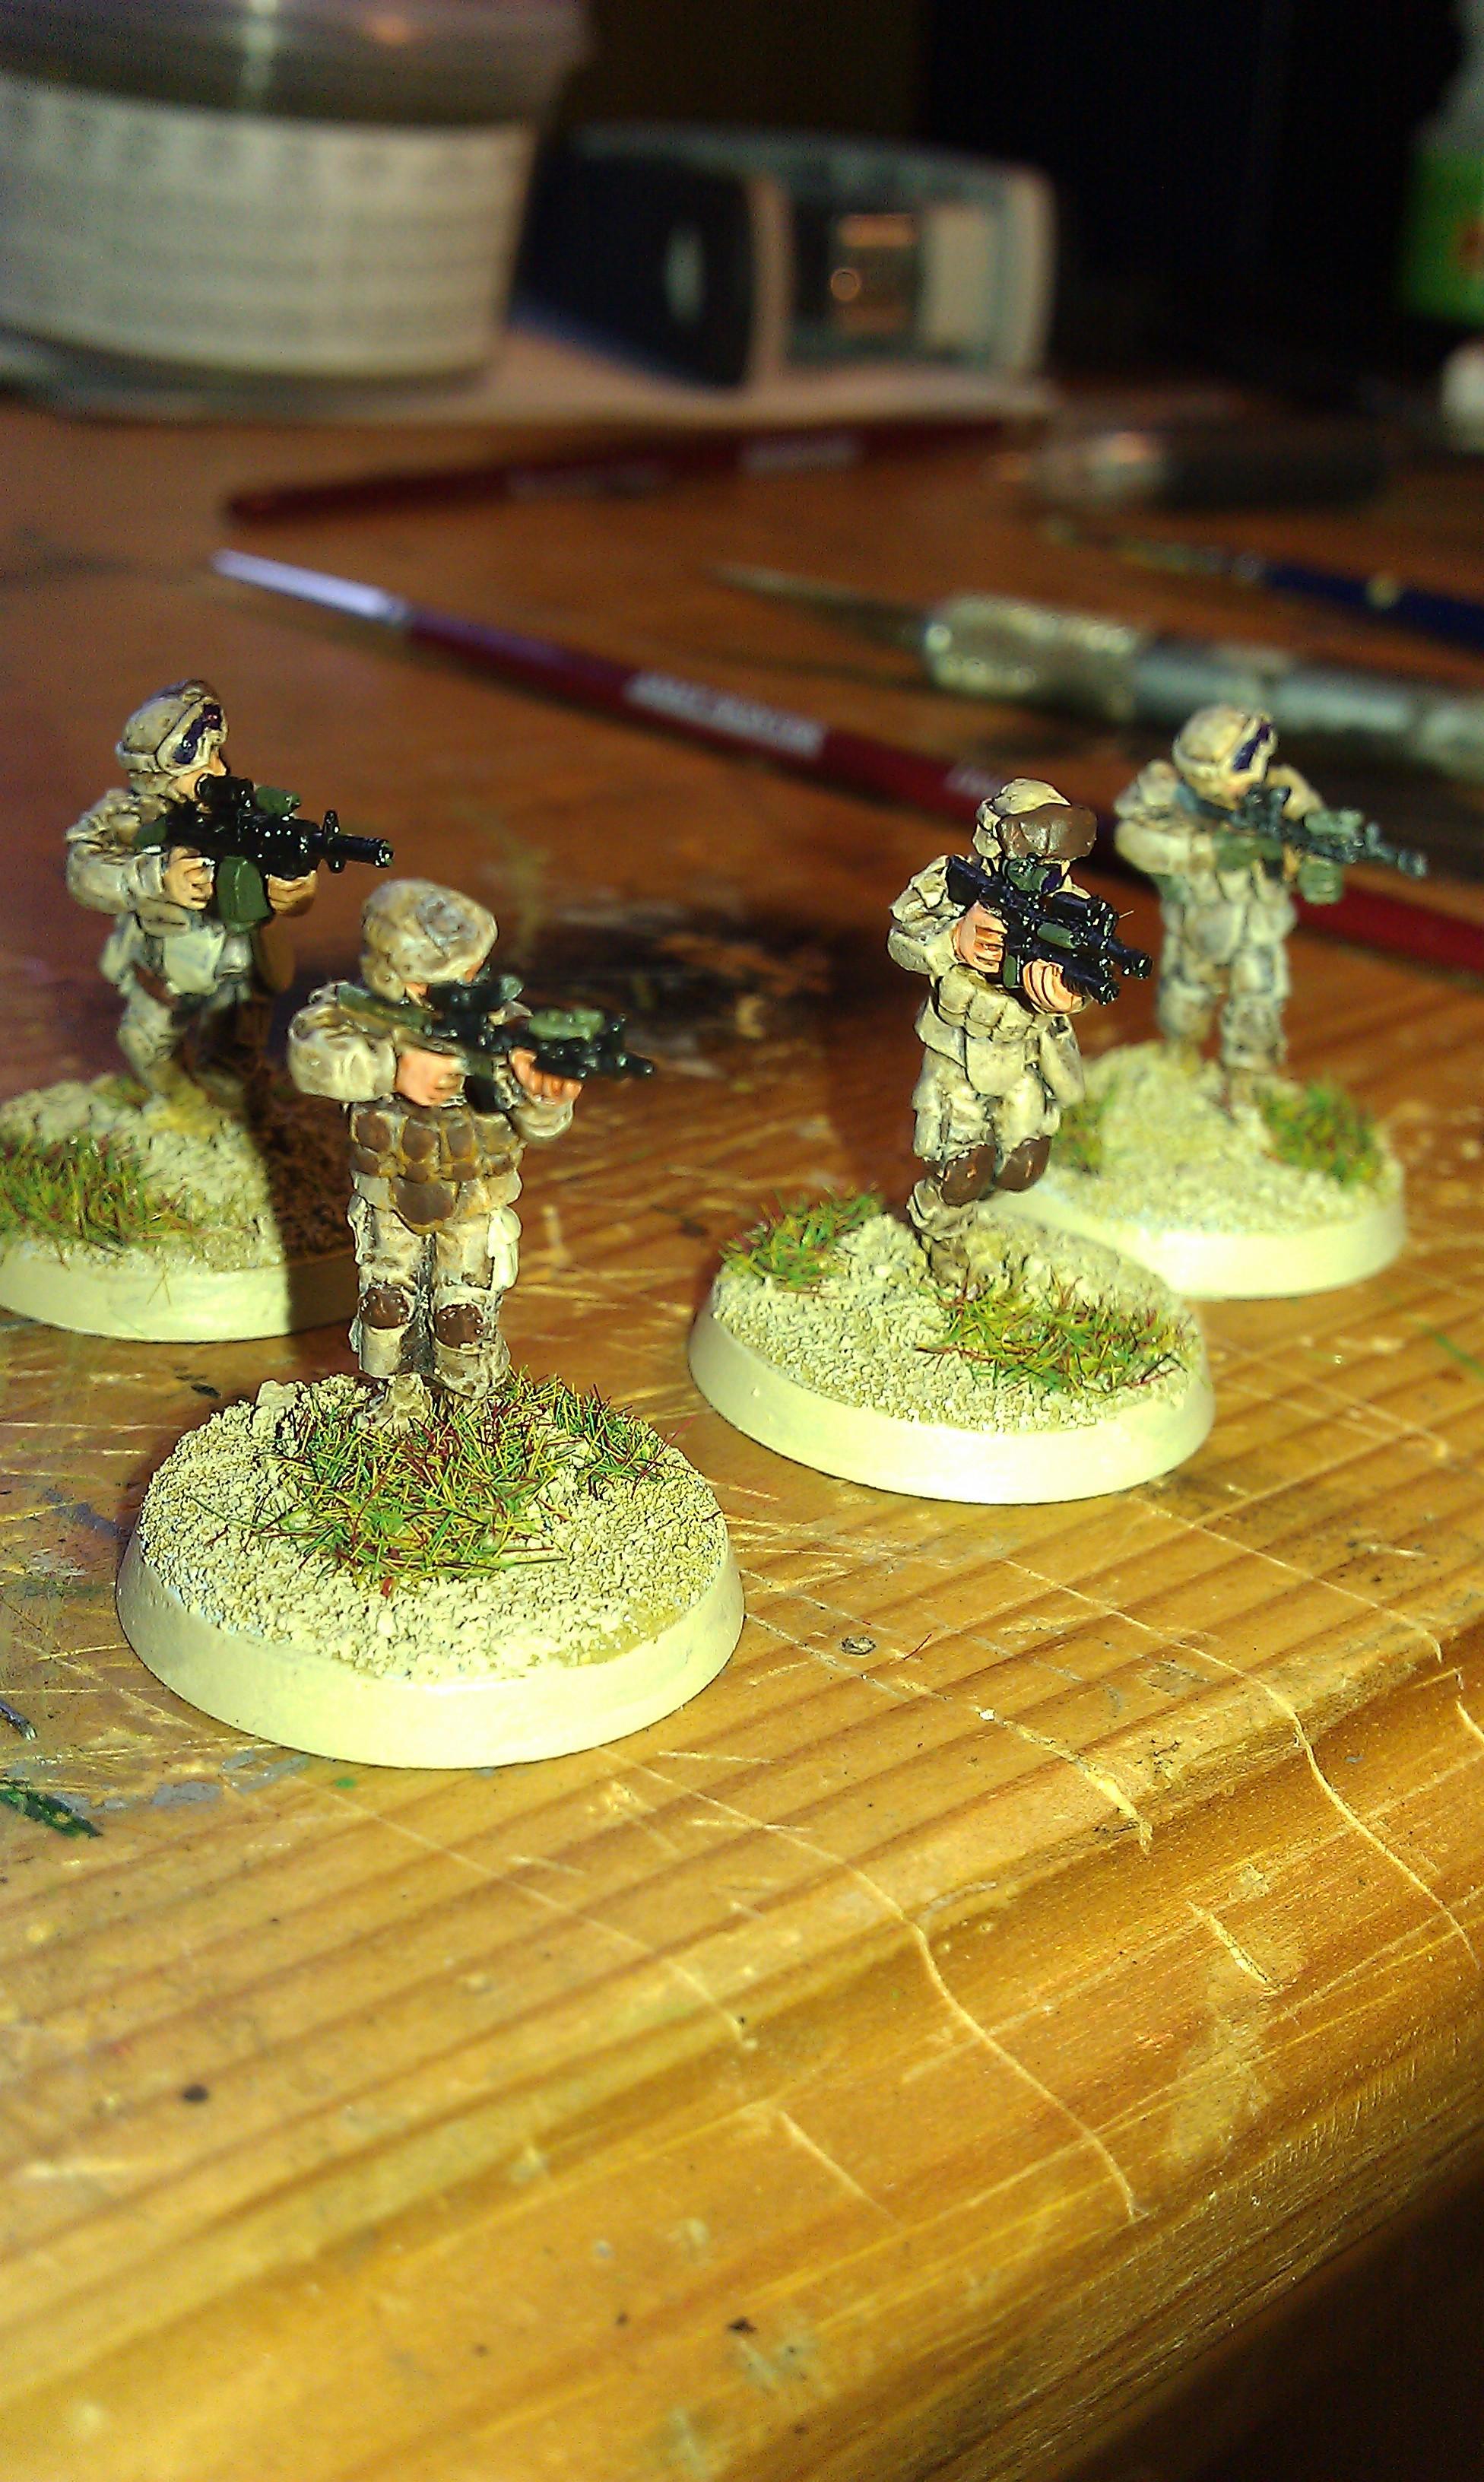 20mm, Elheim, Historical, Infantry, Modern, Space Marines, United States Marine Corps, Usmc